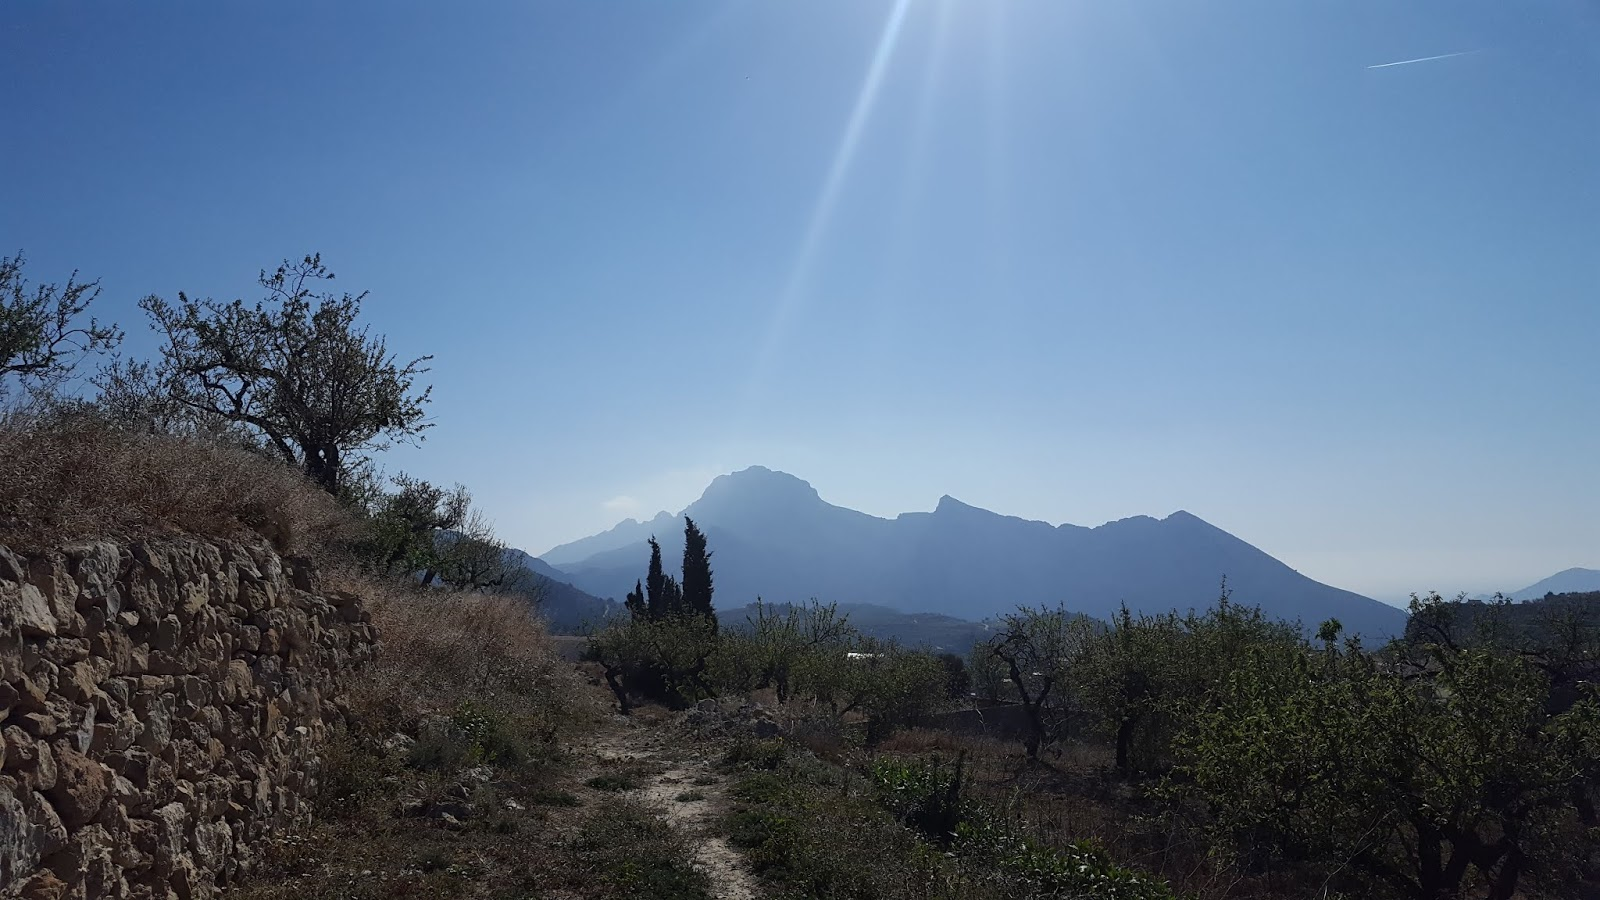 Sierra de Bernia from la Panavista, Tàrbena, Alicante